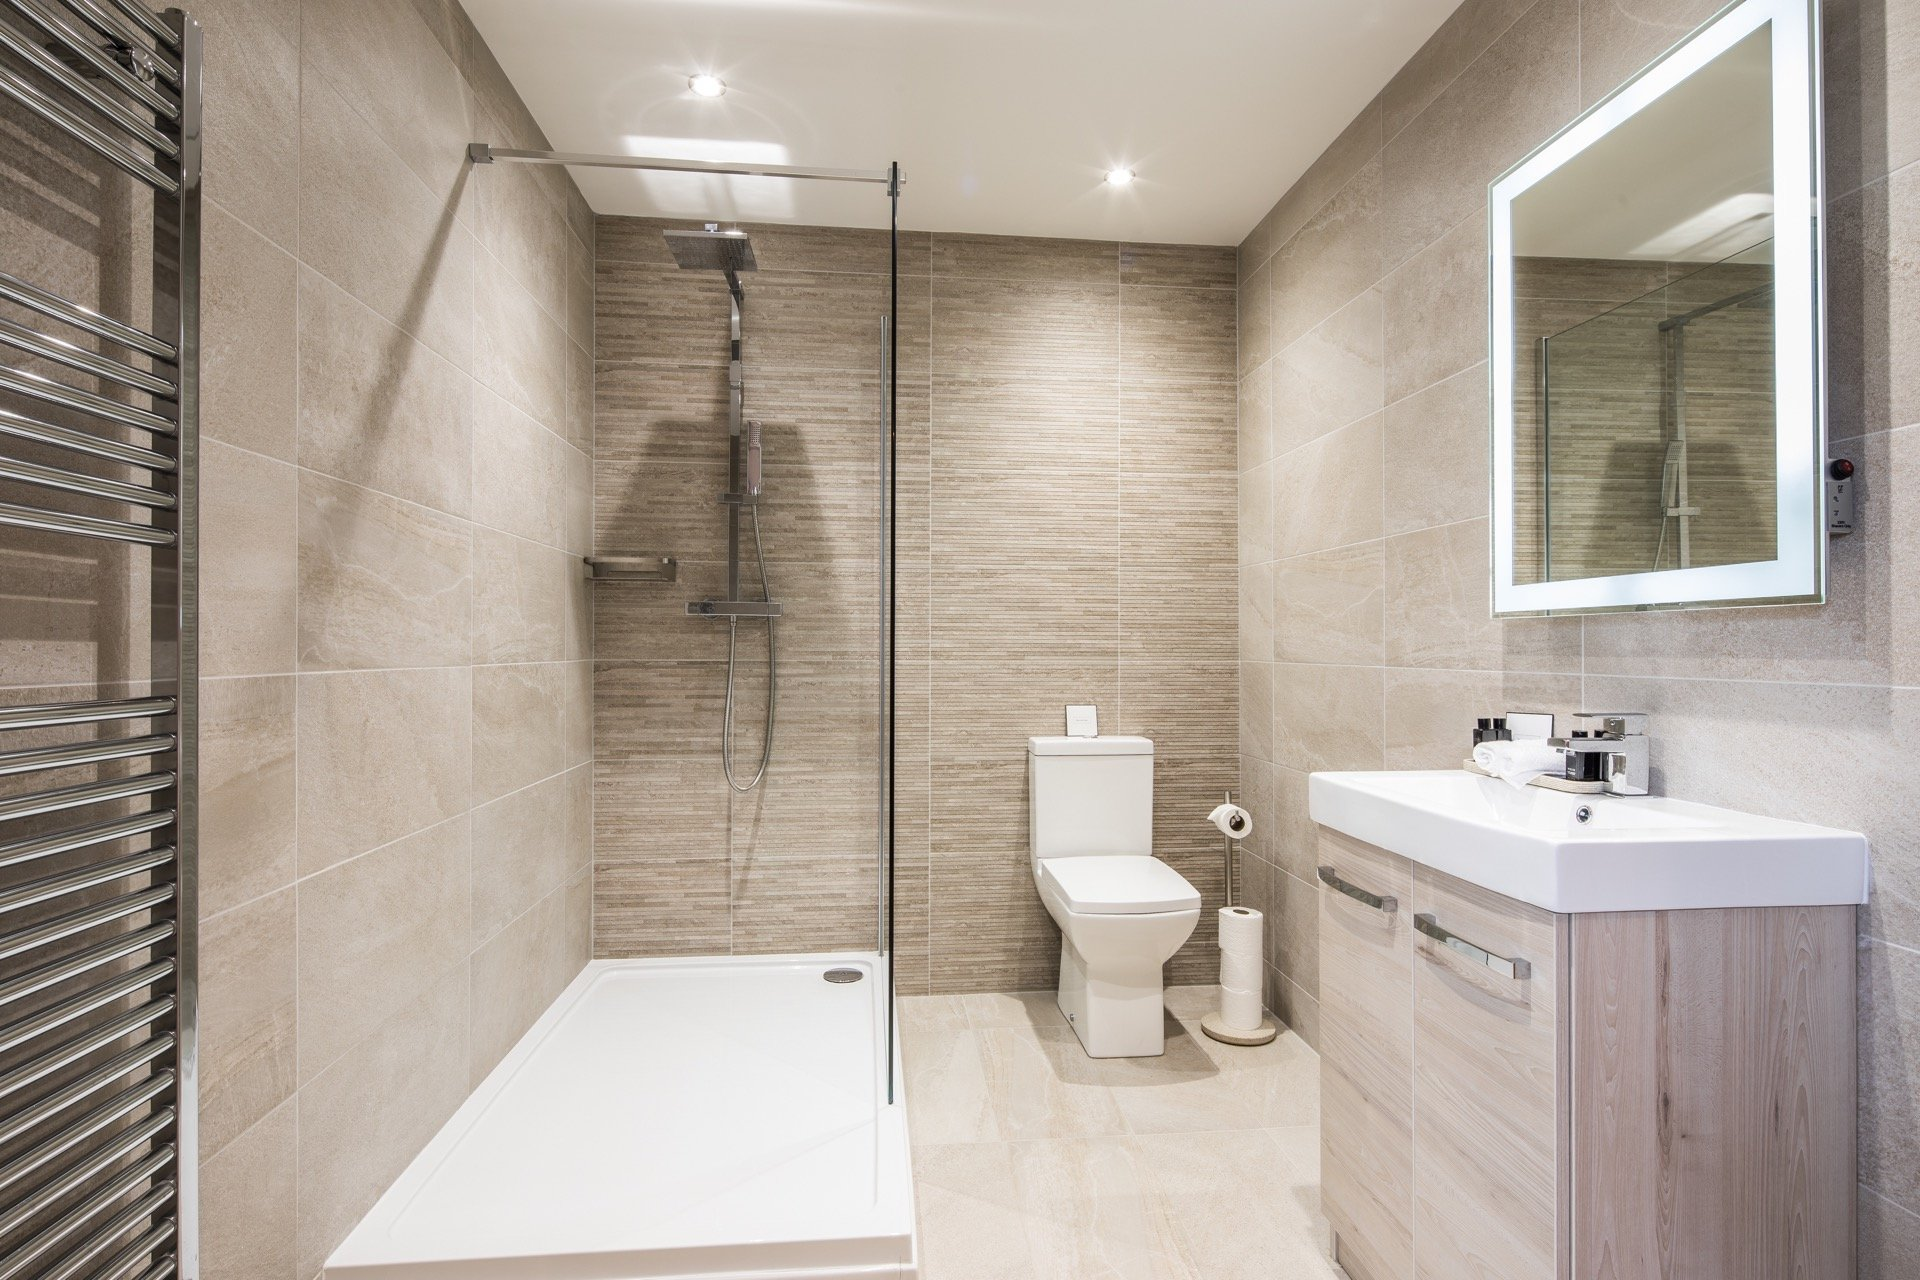 interior of bathroom of open house in Kelowna